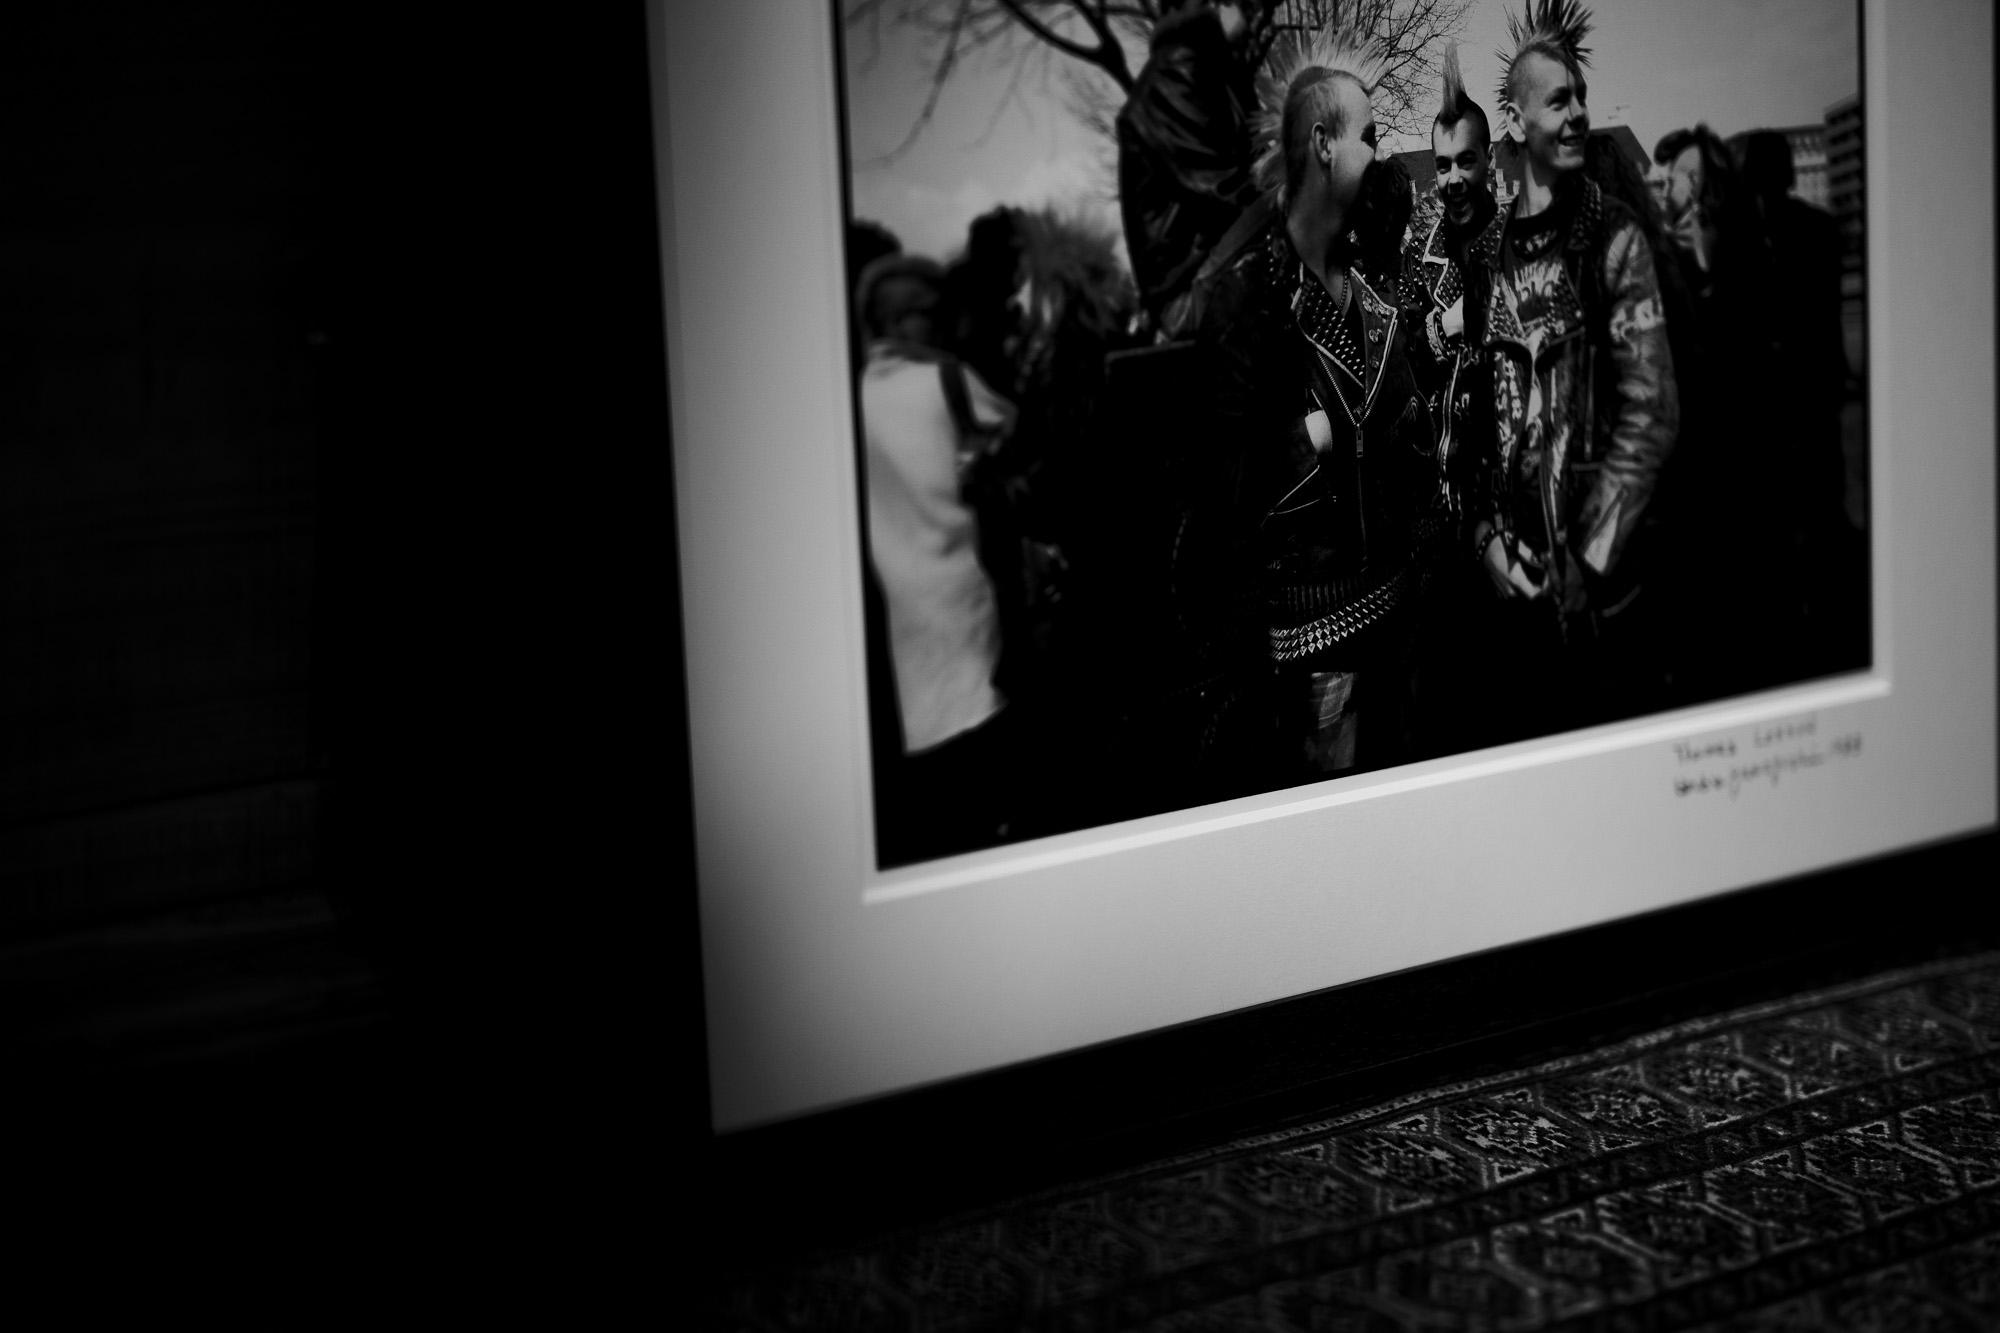 Thames LONDON / HERBIE YAMAGUCHI 1983 テムズ川 ロンドン ハービー山口 1983年 イギリス England イングランド 写真家 写真 http://www.herbie-yamaguchi.com/ オリジナルプリント Portrait Joe 地下鉄のジョー パンク Punk 愛知 名古屋 Alto e Diritto altoediritto アルトエデリット  革ジャン レザージャケット ライダースジャケット モヒカン 鋲ジャン 1983年イギリス総選挙 イギリス名誉革命史 United Kingdom General Election, 1983 ハービー・山口は写真家、エッセイスト。 東京都大田区出身。 作家名の由来は、自身が傾倒していたジャズ・フルート奏者のハービー・マンから。山口 芳則 「LONDON AFTER THE DREAM」(流行通信社 1985)「LEICA LIVE LIFE」福山雅治写真集 (ソニーマガジンズ 1994)「代官山17番地」(アップリンク 1998)「尾崎豊」(光栄 1998)「DISTANCE」福山雅治写真集 (アミューズブックス 1999「TIMELESS IN LUXEMBOURG」 (ルクセンブルク大公国大使館 1999)「bridge22 LP」山崎まさよし×ハービー・山口(ソニーマガジンズ 2001)「LONDON CHASING THE DREAM 」(カラーフィールド 2003)「peace」(アップリンク 2003)フジテレビドラマ「優しい時間―富良野にて」(フジテレビ出版 2005)「HOPE 空、青くなる」(講談社 2003)代官山17番地